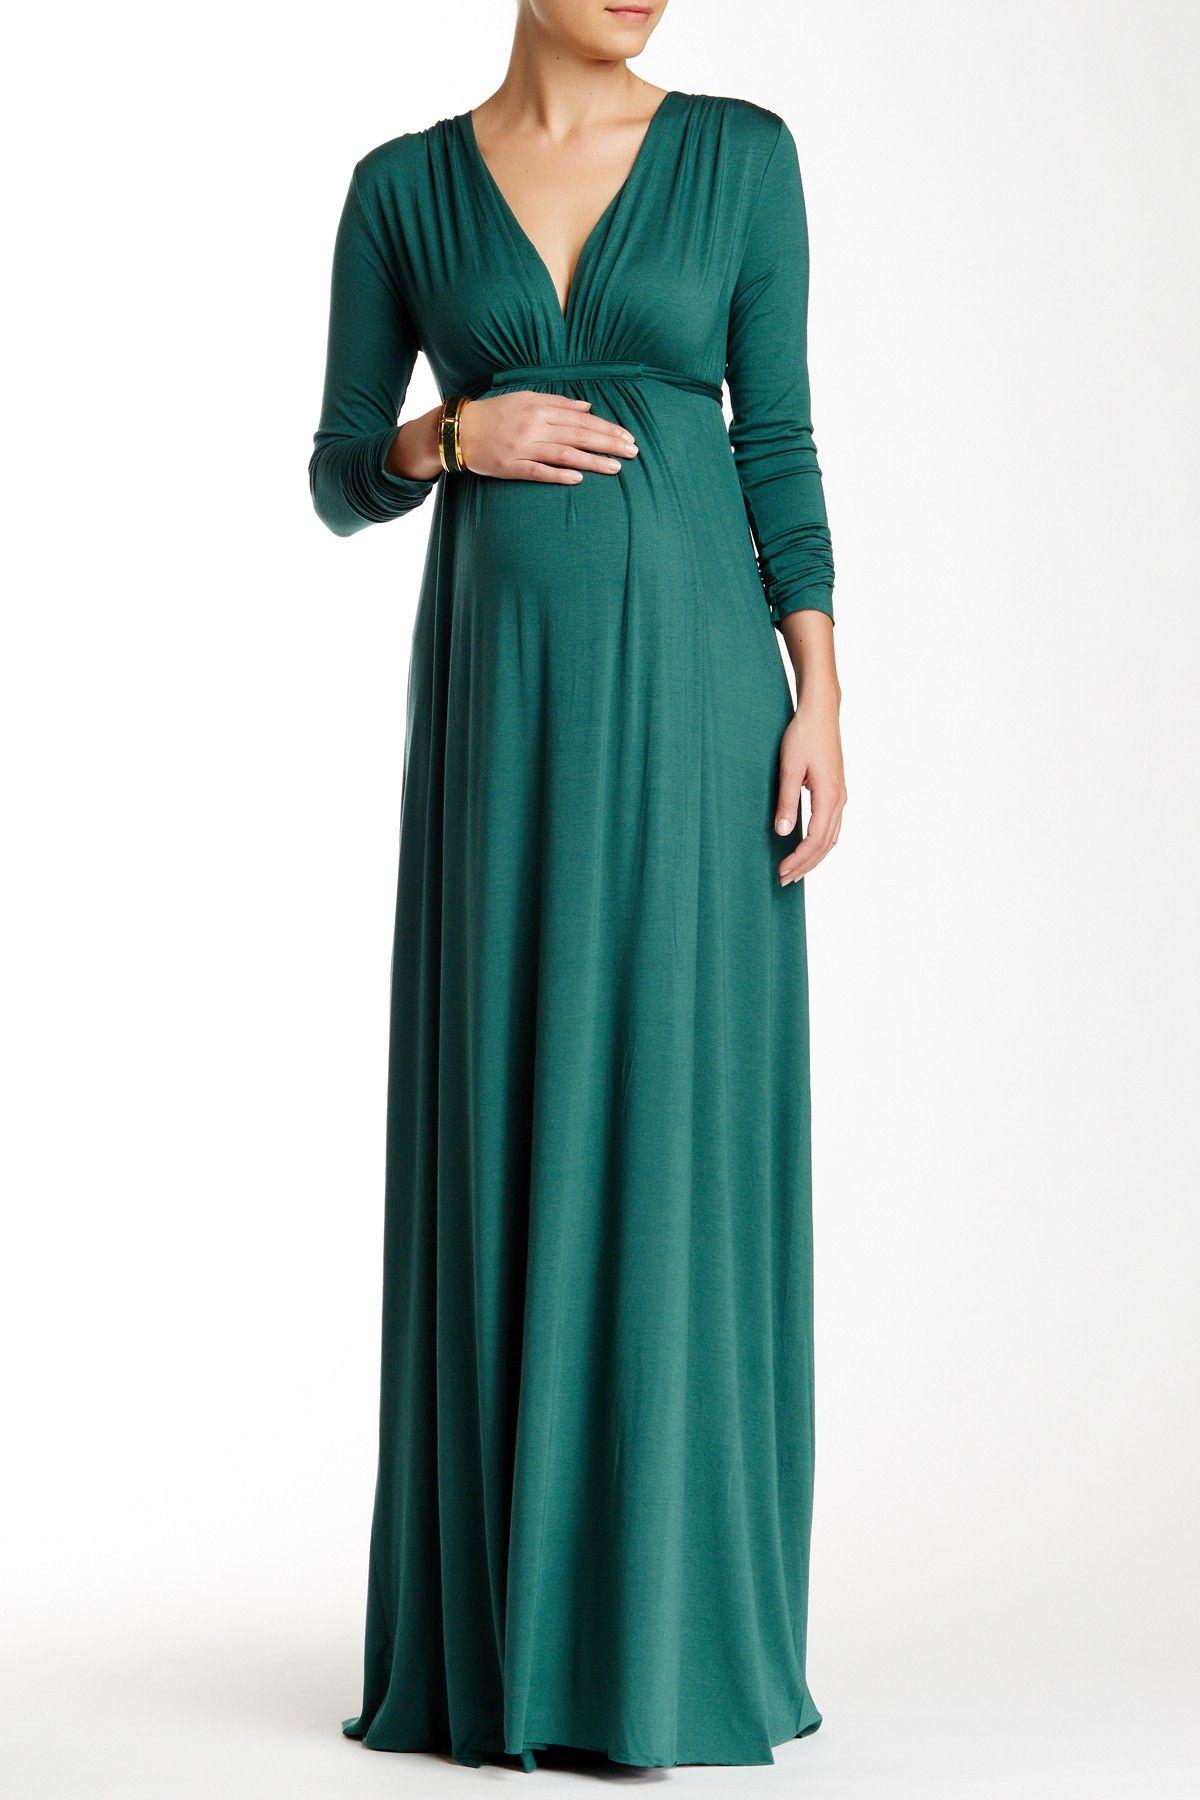 Long sleeve full length caftan dress by rachel pally maternity on long sleeve full length caftan dress by rachel pally maternity on hautelook ombrellifo Images